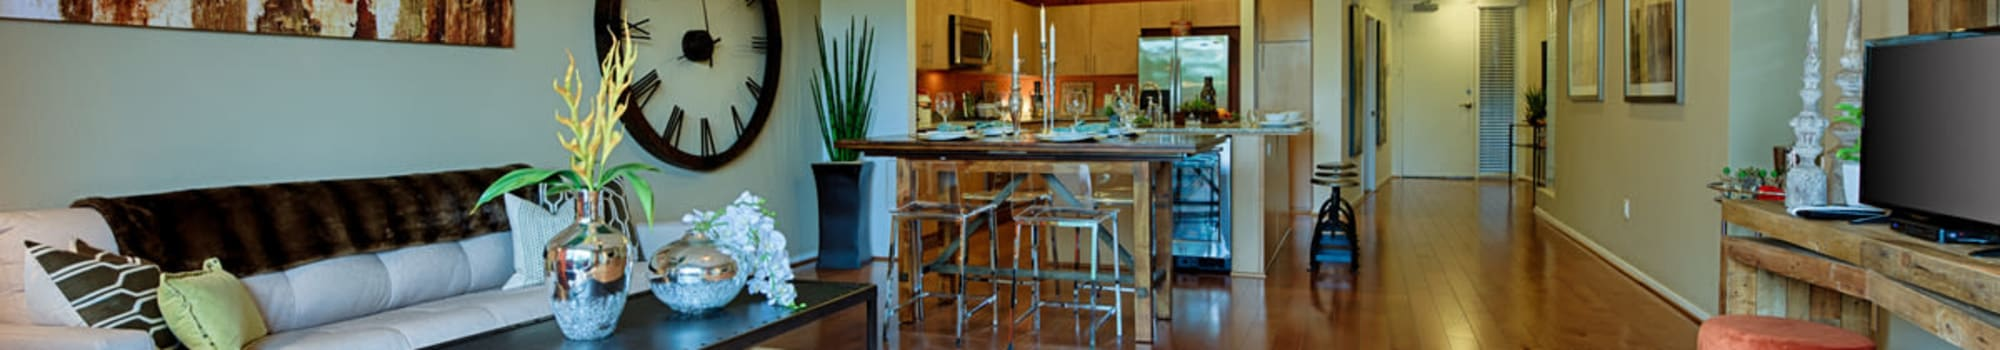 Floor Plans at Ten Wine Lofts in Scottsdale, Arizona